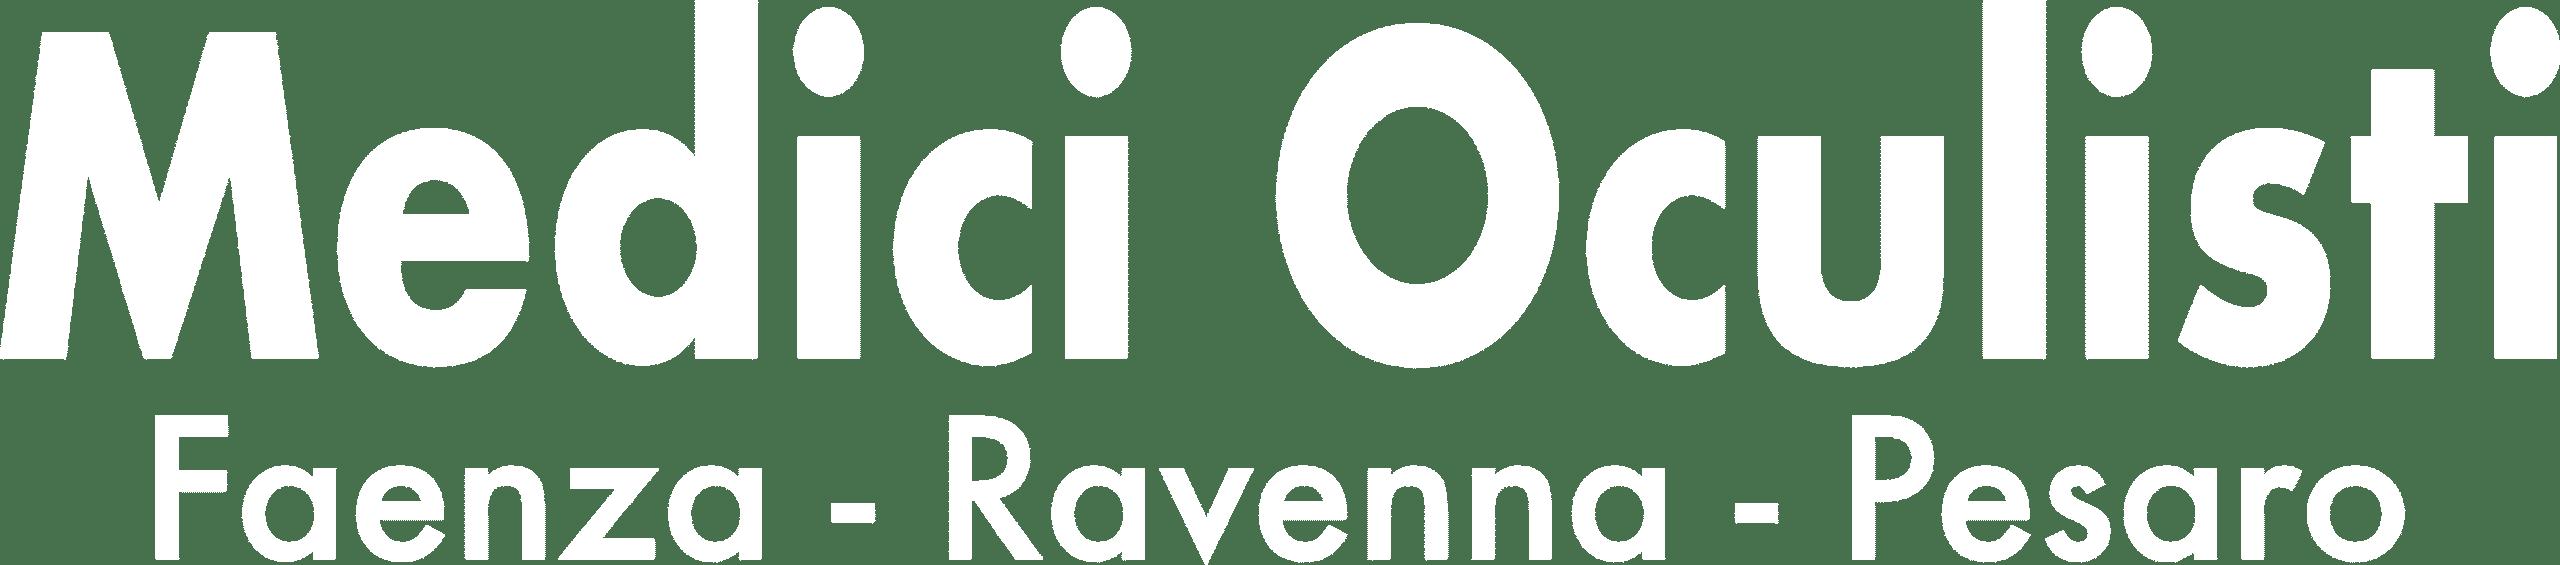 Oculisti Faenza Ravenna: Dr. A. Lanfernini - Dr.sa A. Moscariello